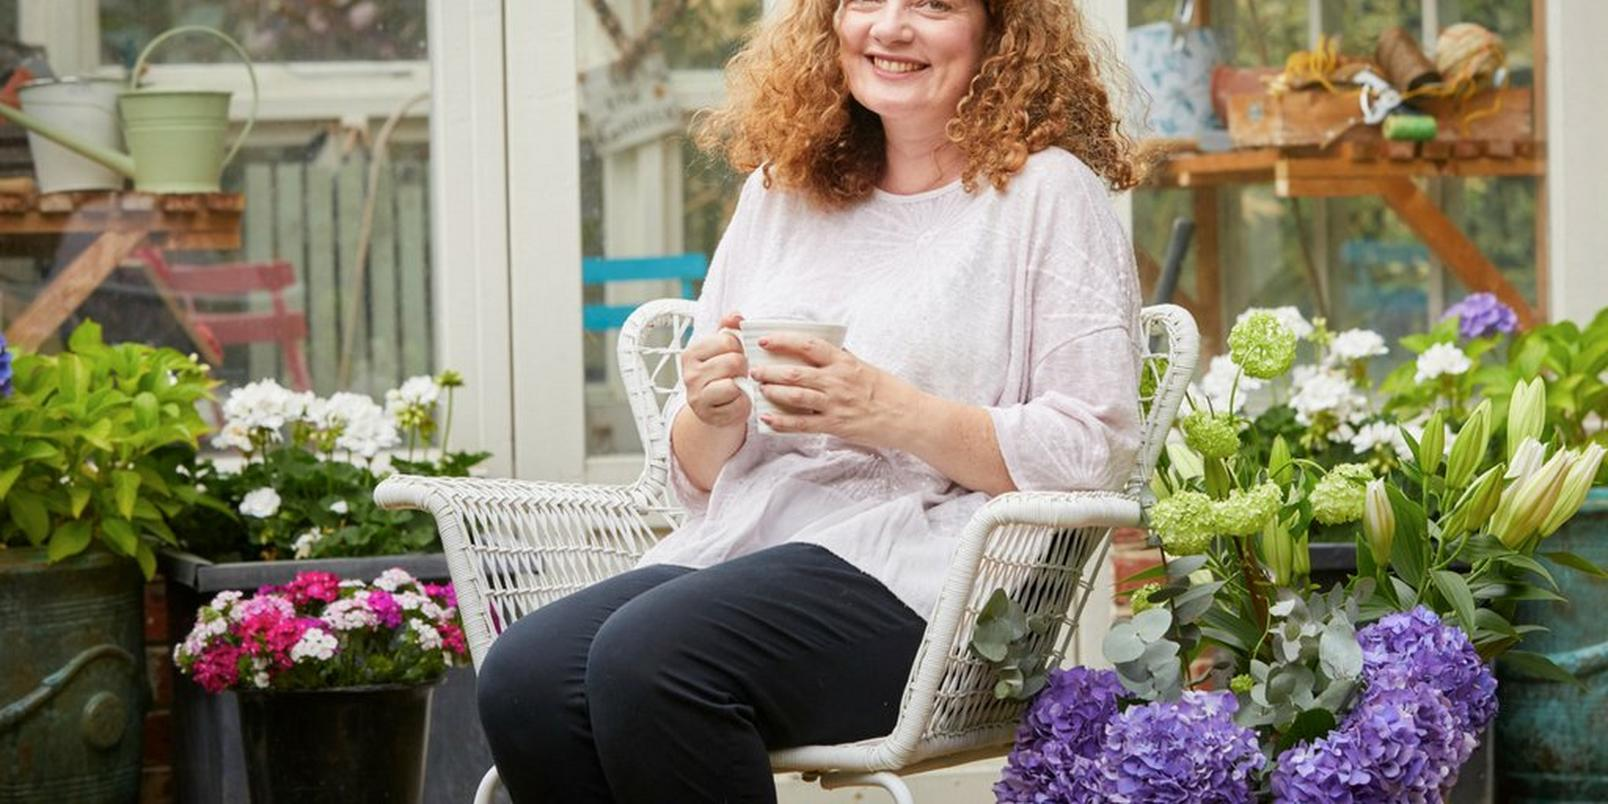 laura-leong-interflora-florist-year-2018-6